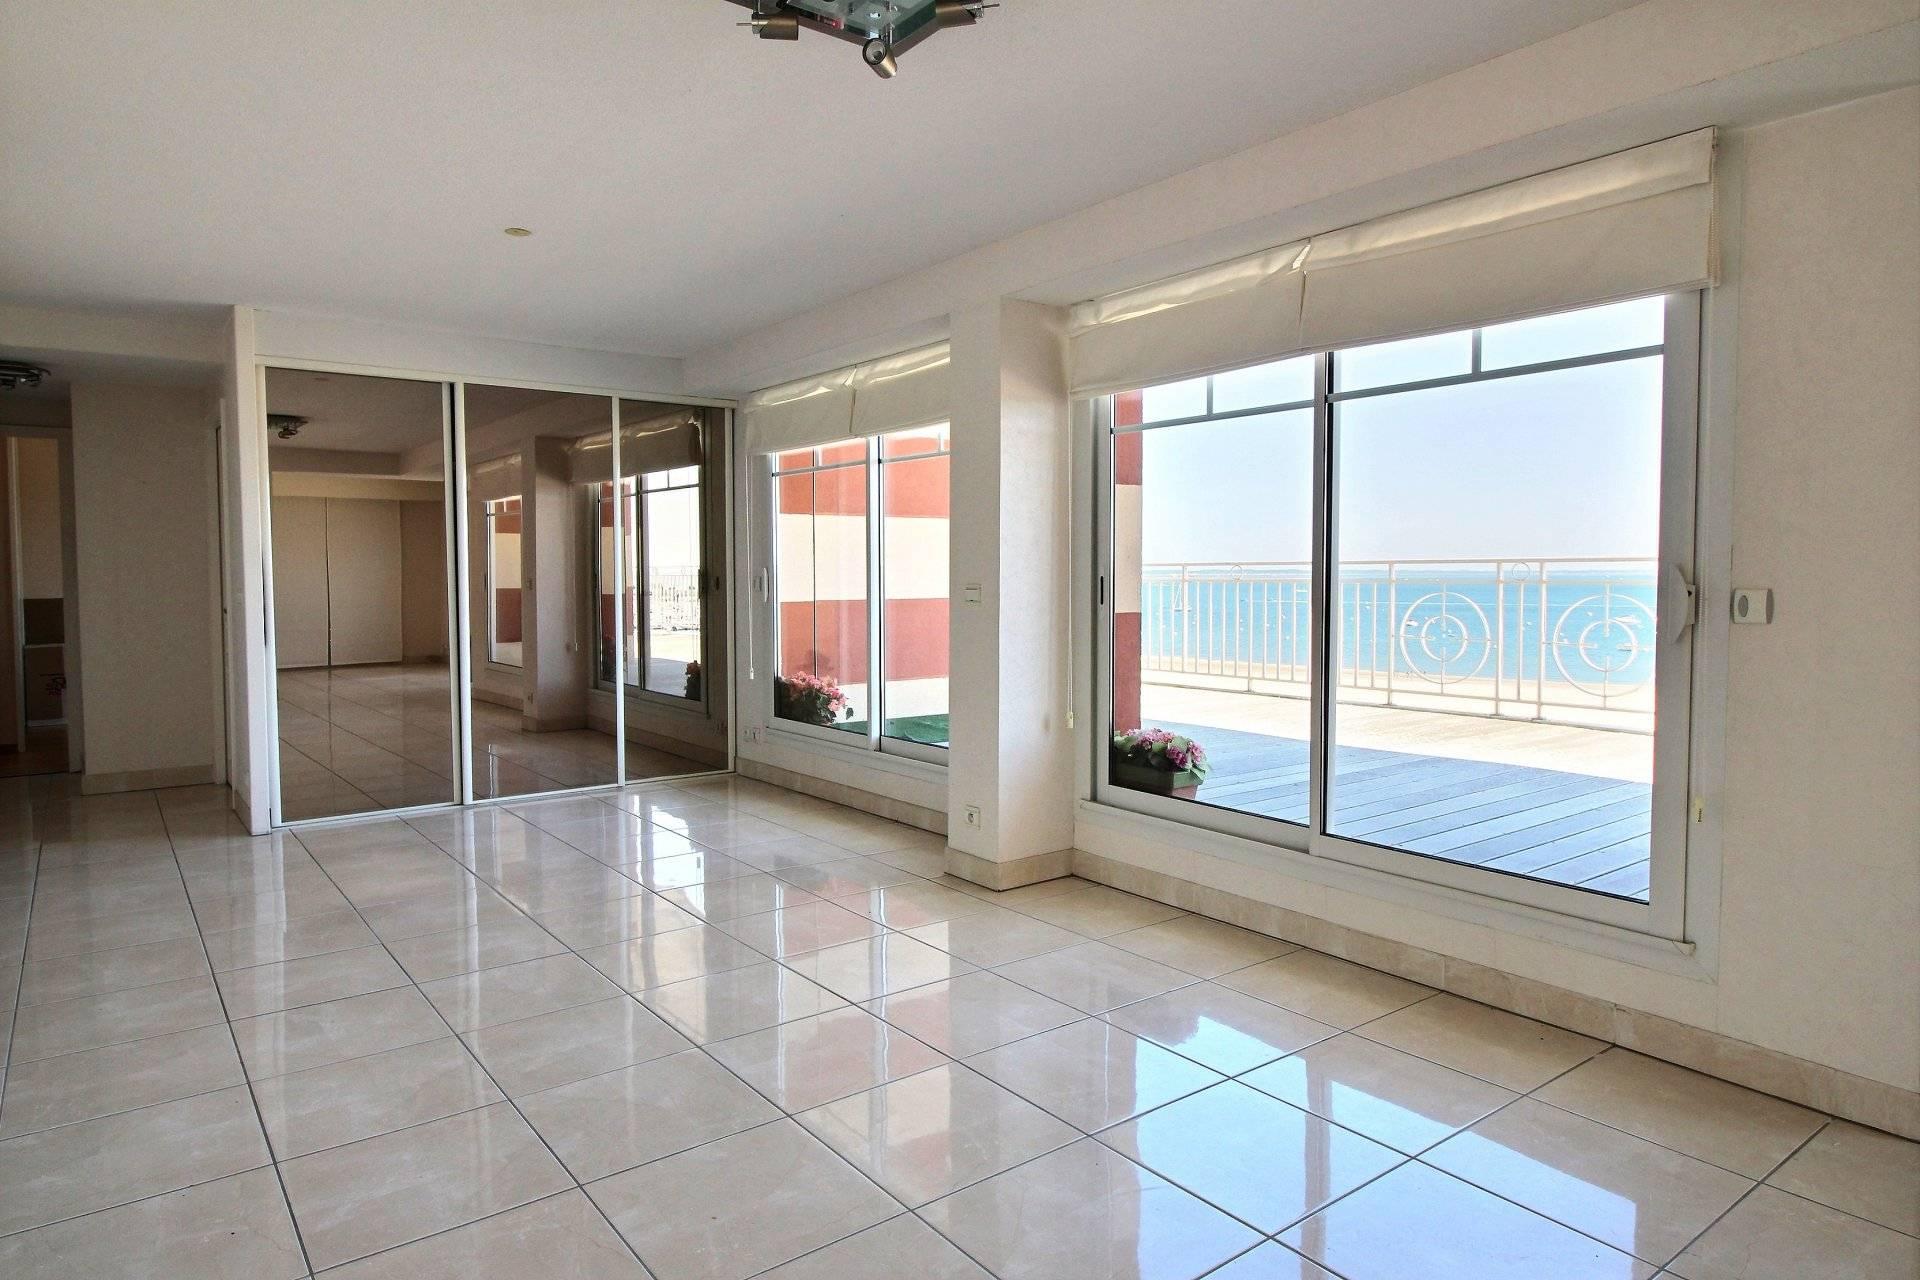 vente appartement front de mer arcachon immobilier de luxe coldwell banker. Black Bedroom Furniture Sets. Home Design Ideas